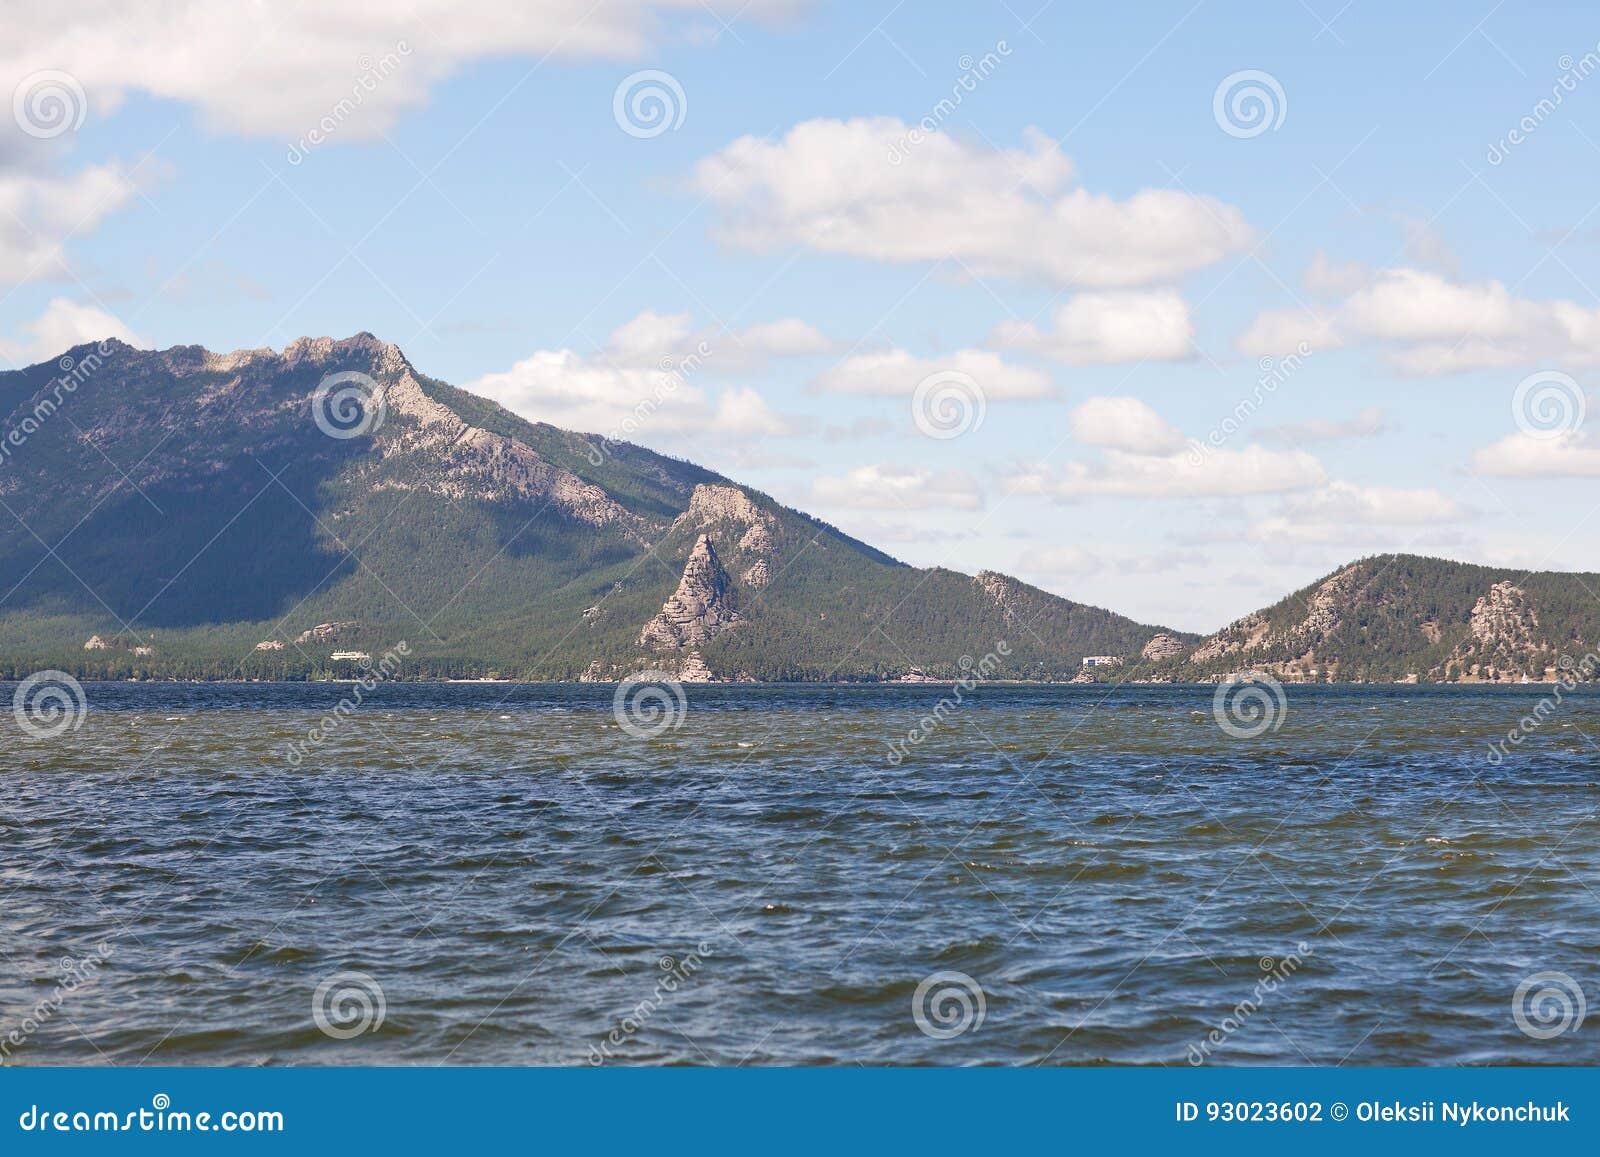 Stone Mountain Hills With Gorest On Lake Borovoe Stock Photo Image